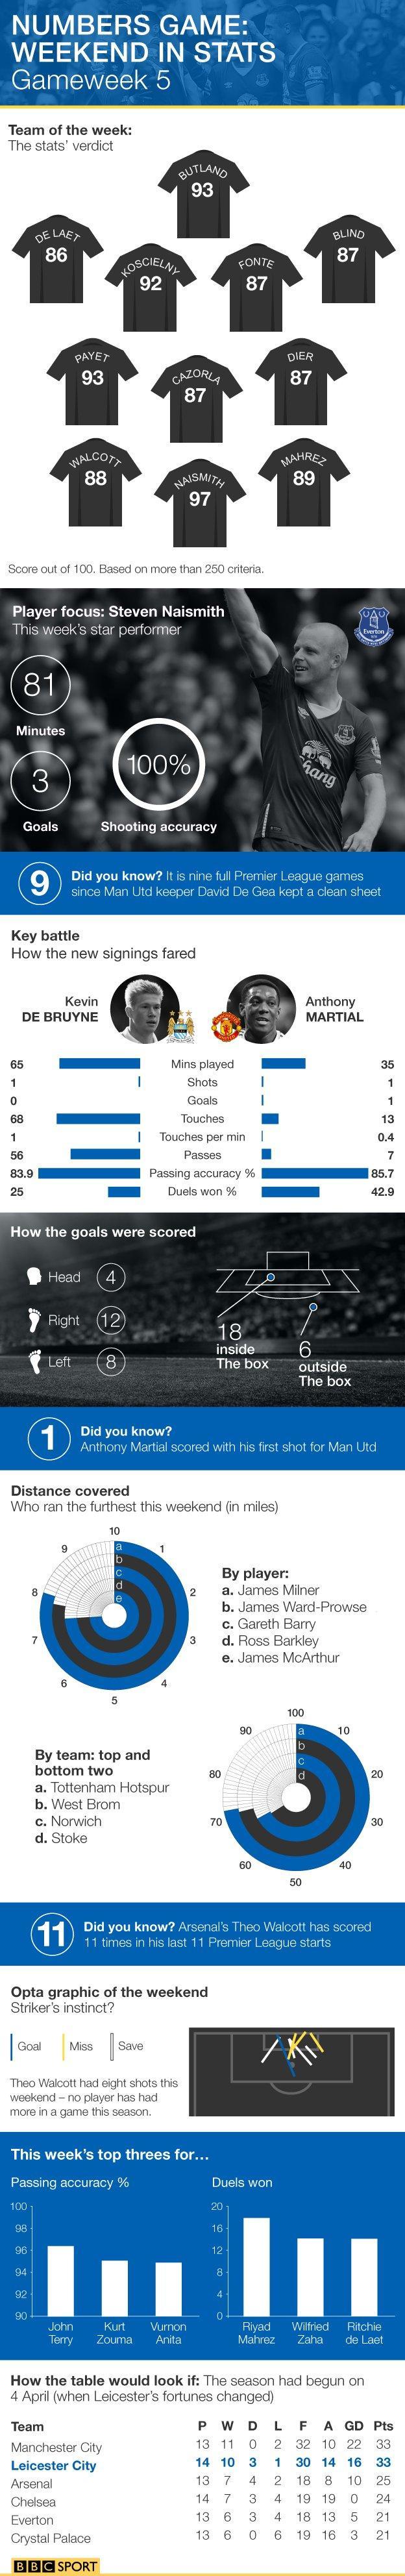 Premier League weekend infographic